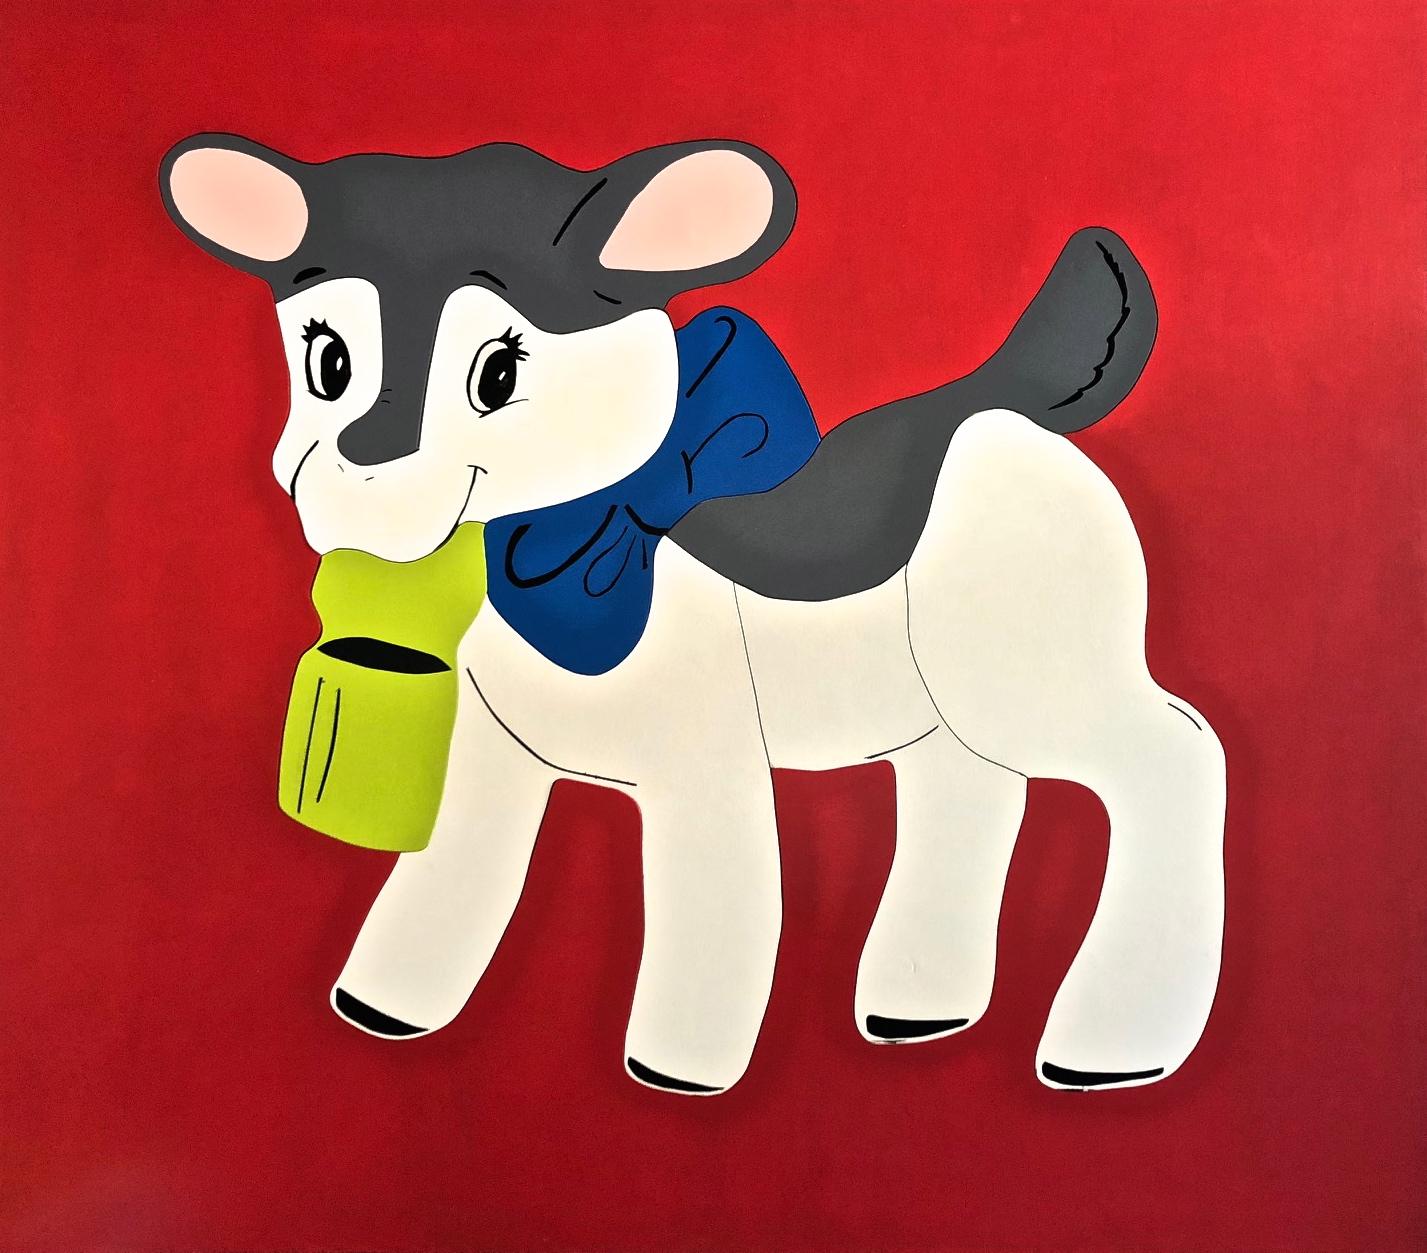 Lamb on Red - Michael Larry Simpson - Latex paint on cut wood - 43_ x 49_ - 2018 - $2,200.jpg